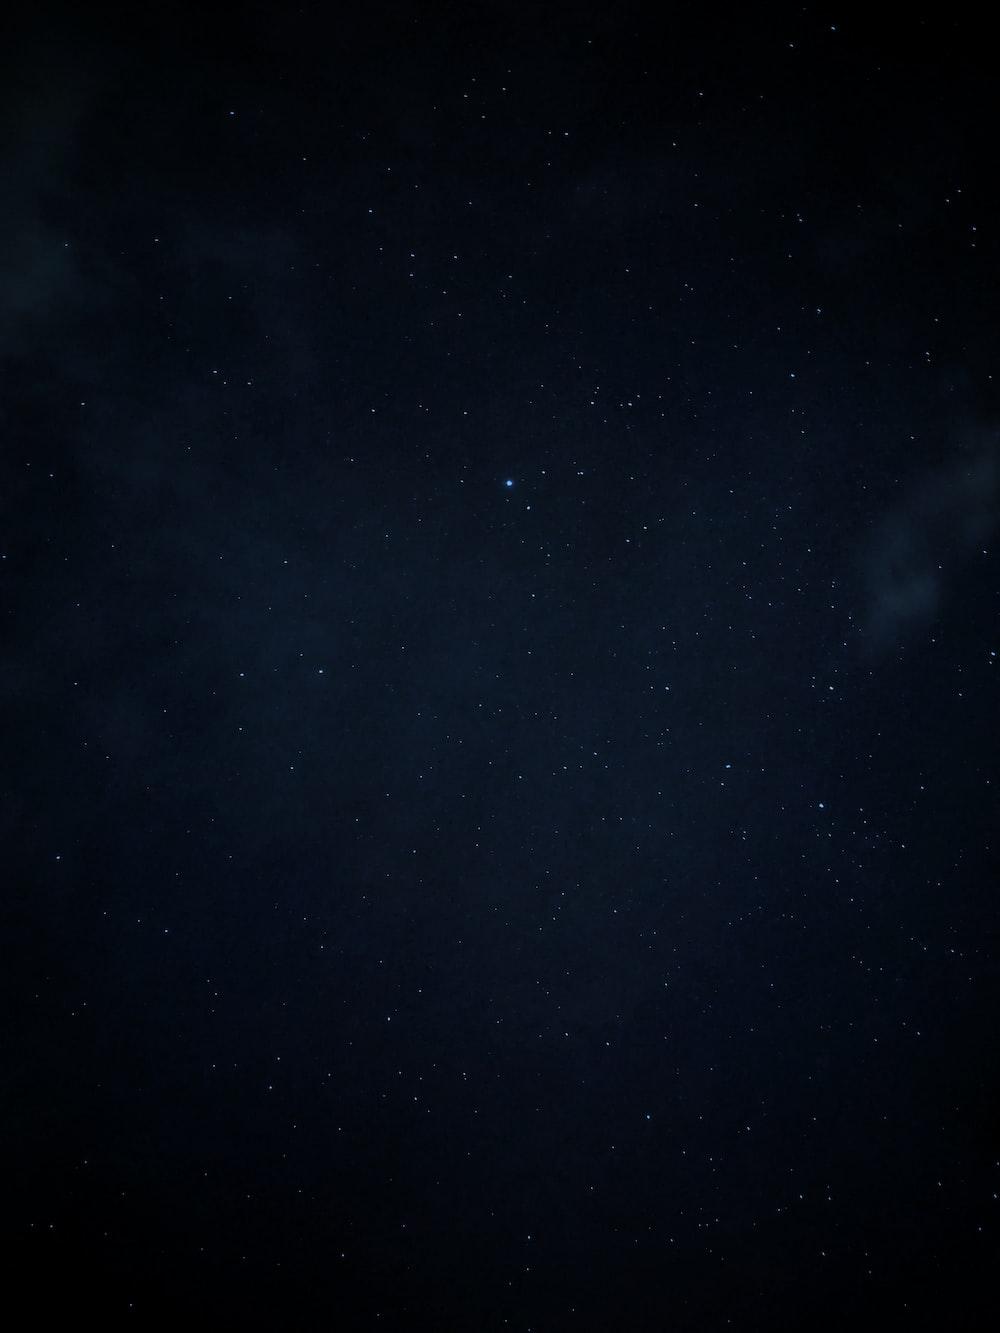 night sky with star